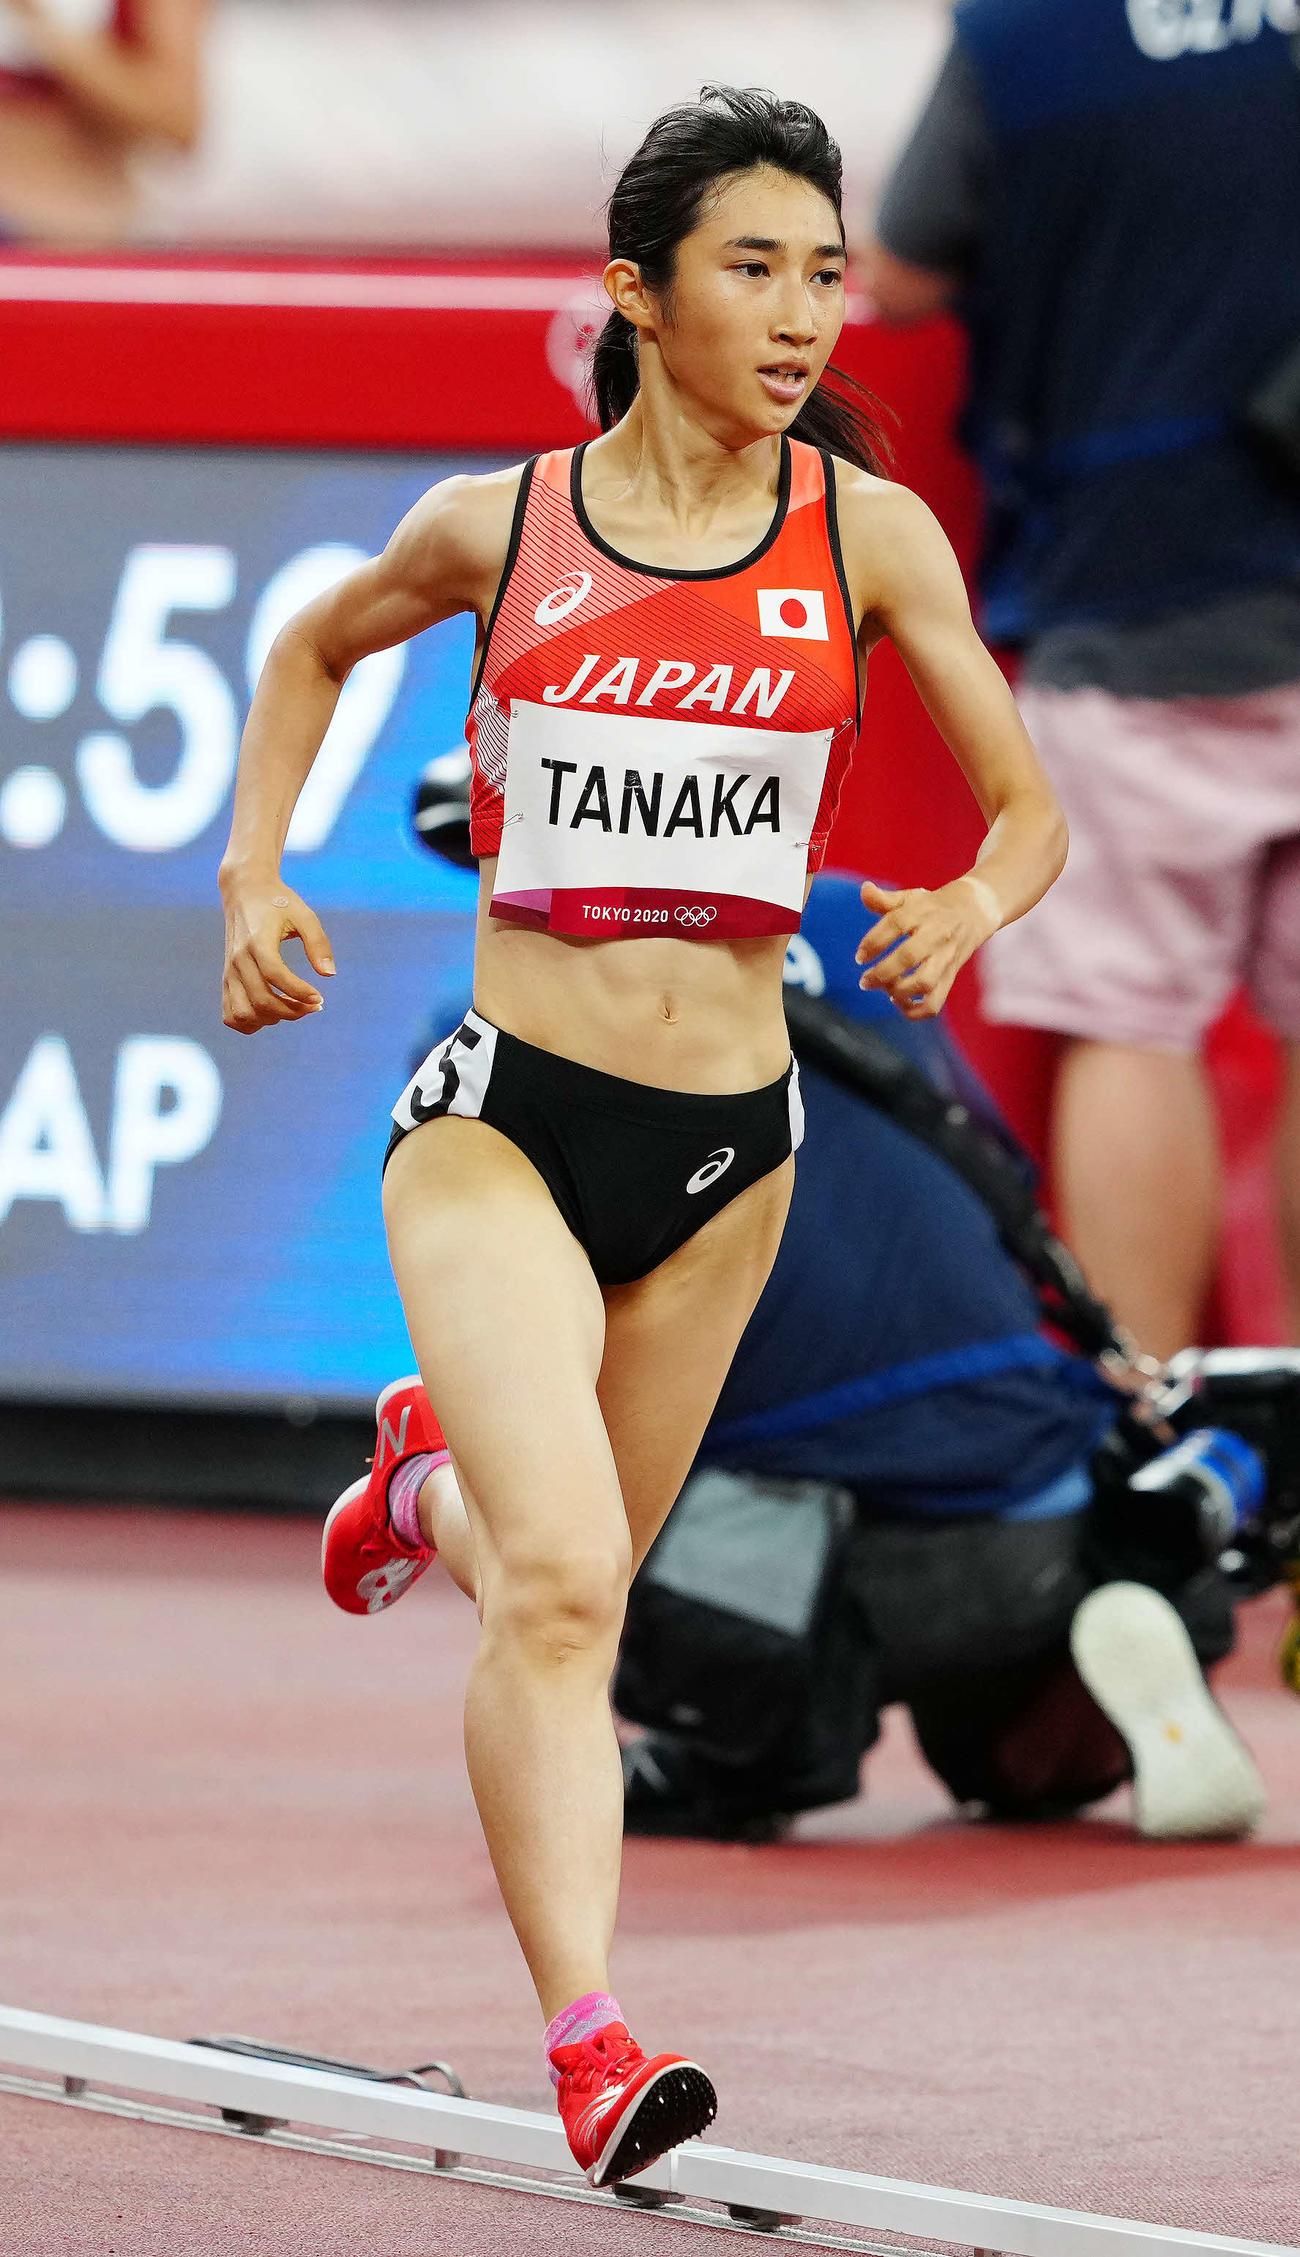 2020年東京五輪 陸上女子1500メートル決勝 力走する田中希実(2021年8月6日撮影)